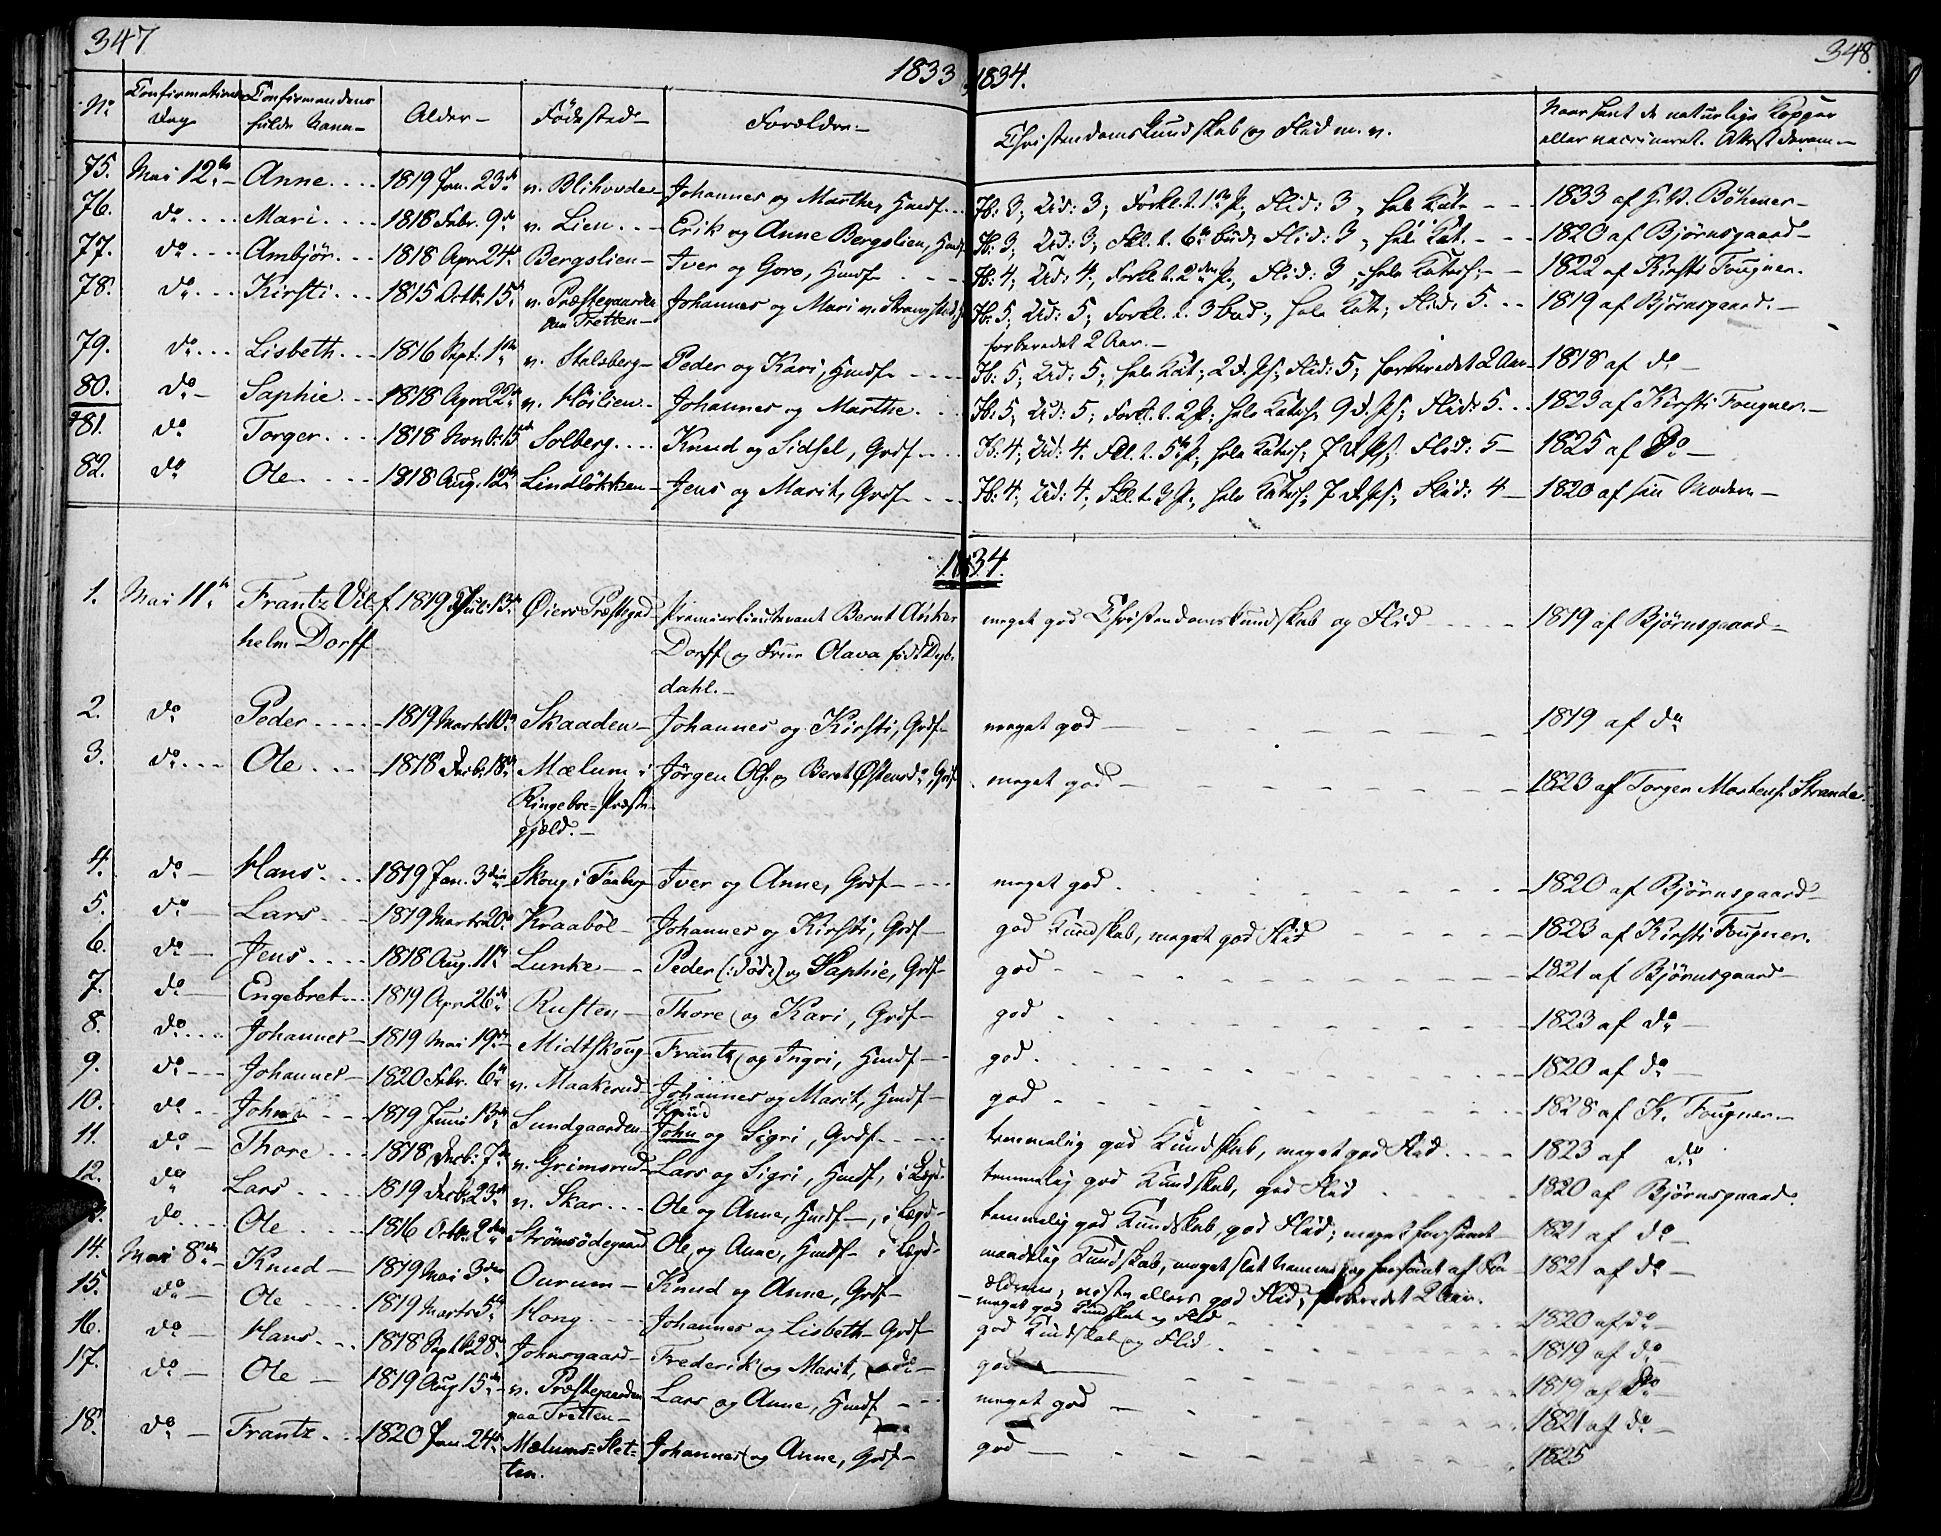 SAH, Øyer prestekontor, Ministerialbok nr. 4, 1824-1841, s. 347-348